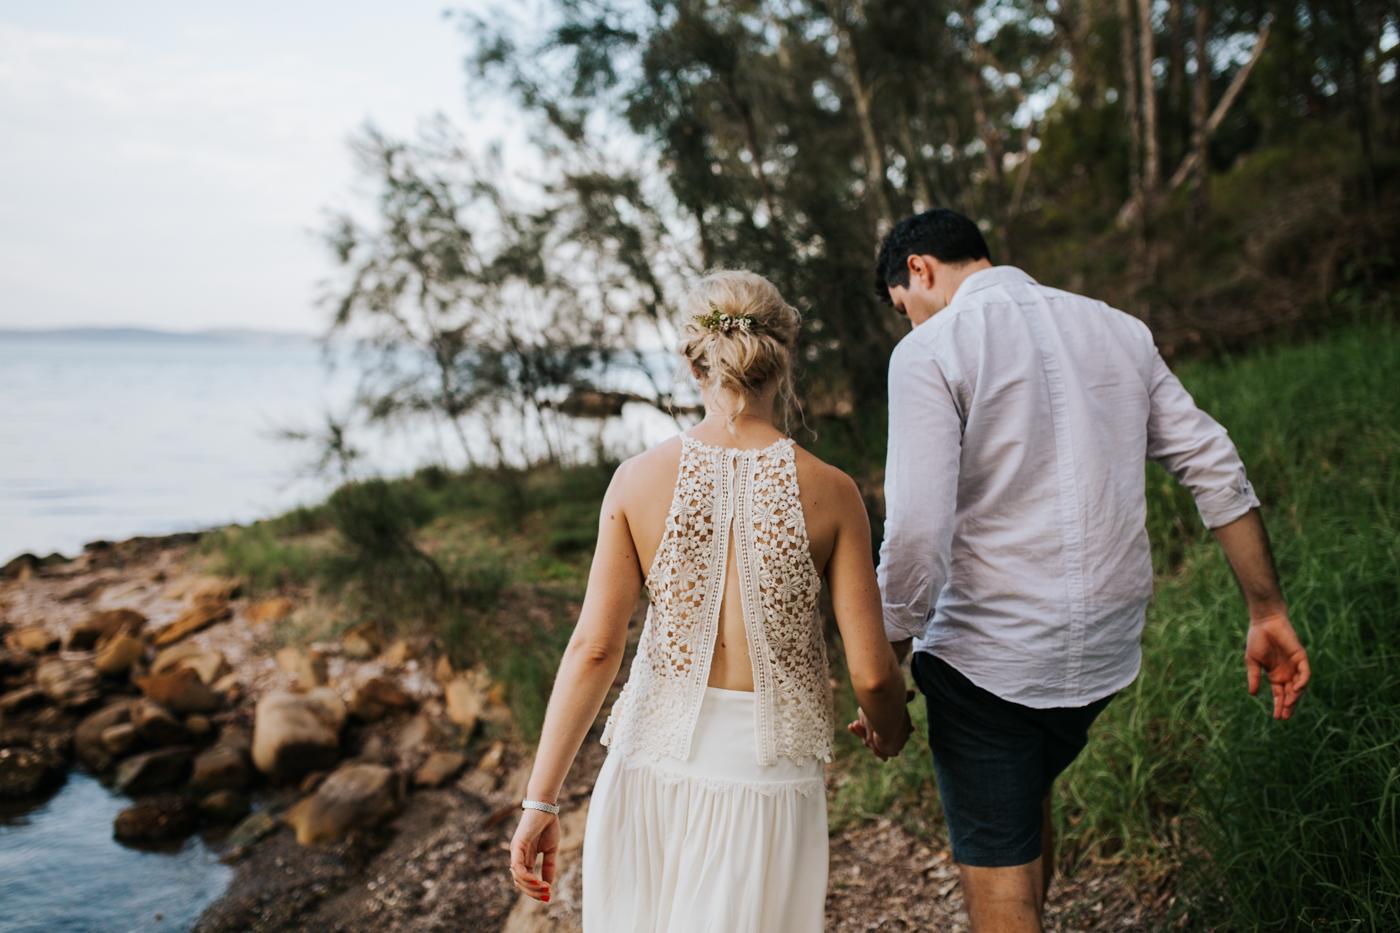 Emma & Ben - Lake Macquarie - Hunter Valley Wedding - Samantha Heather Photography-187.jpg